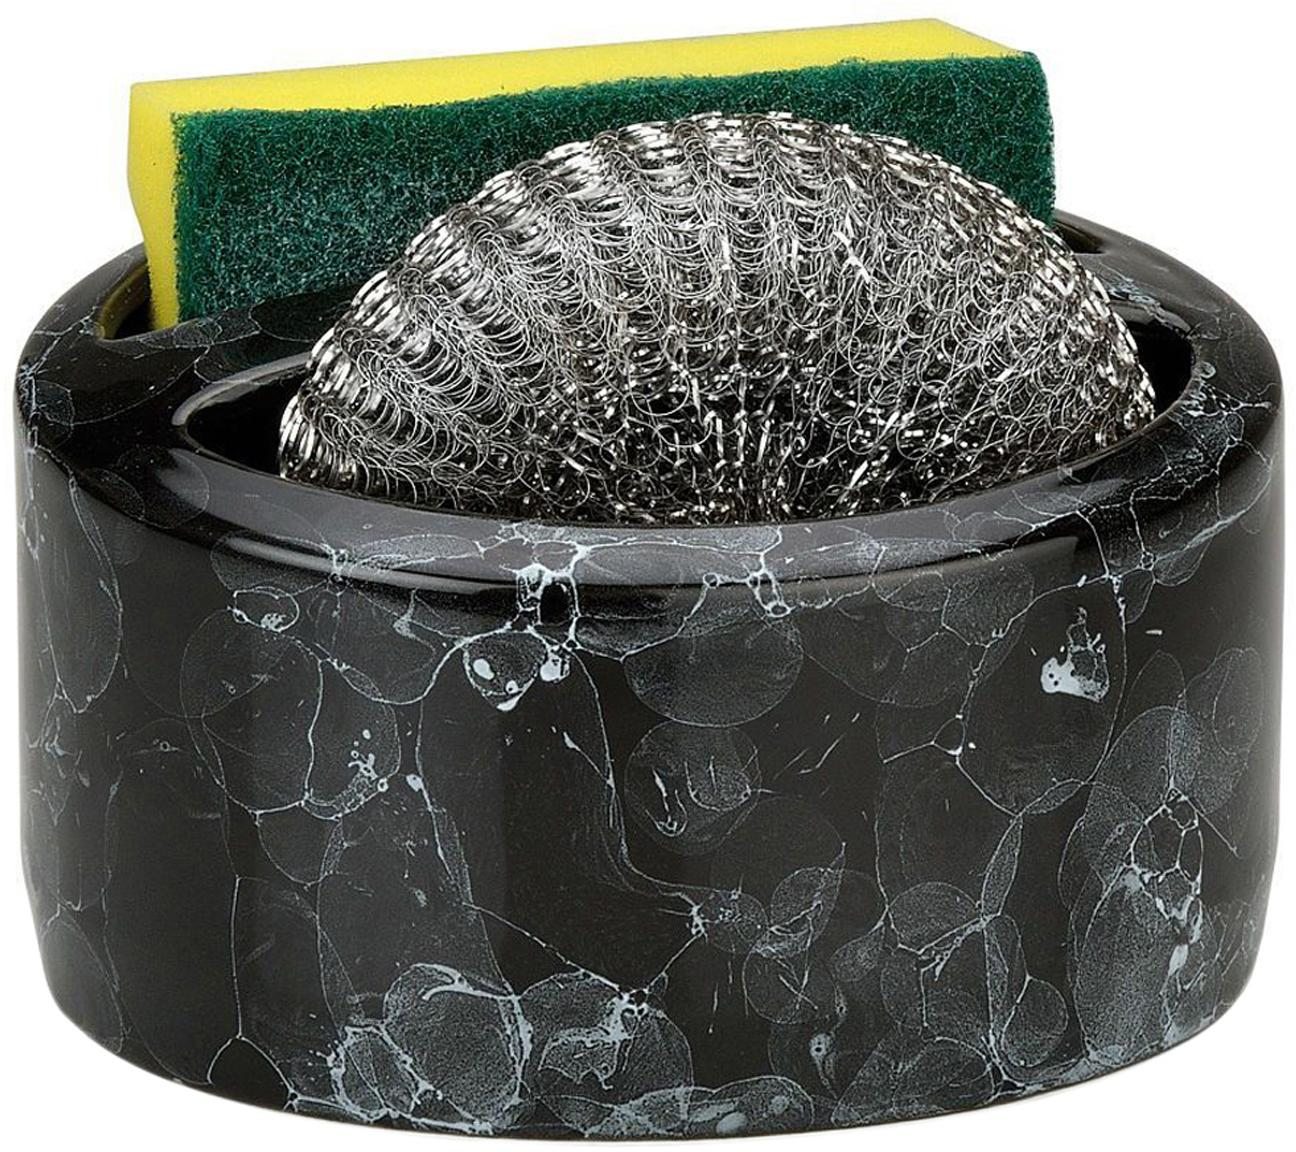 Sponshouder Bubble, 3-delig, Keramiek, Gemarmerd zwart, Ø 14 x H 11 cm